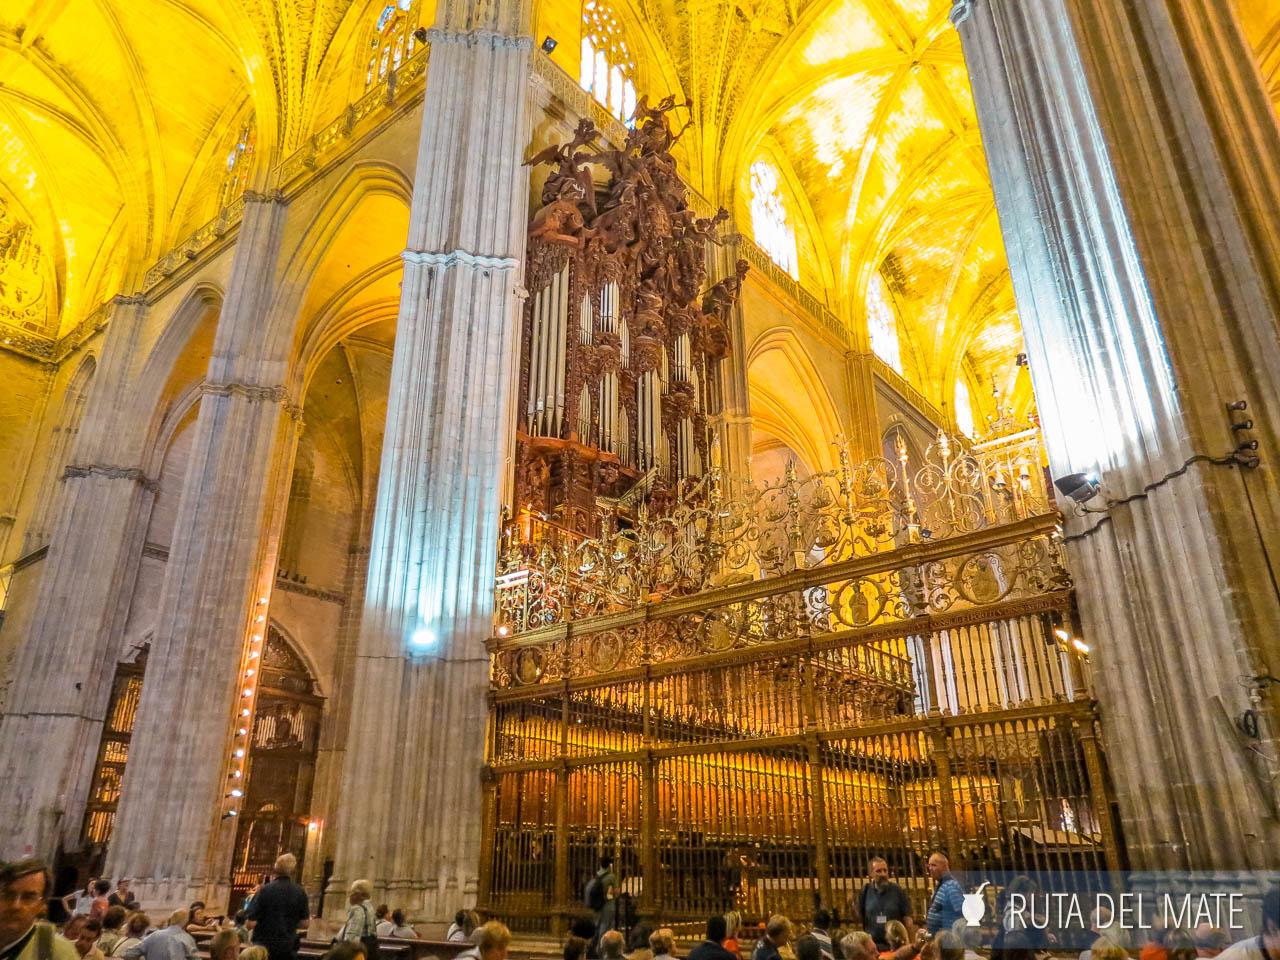 Coro de la Catedral de Sevilla